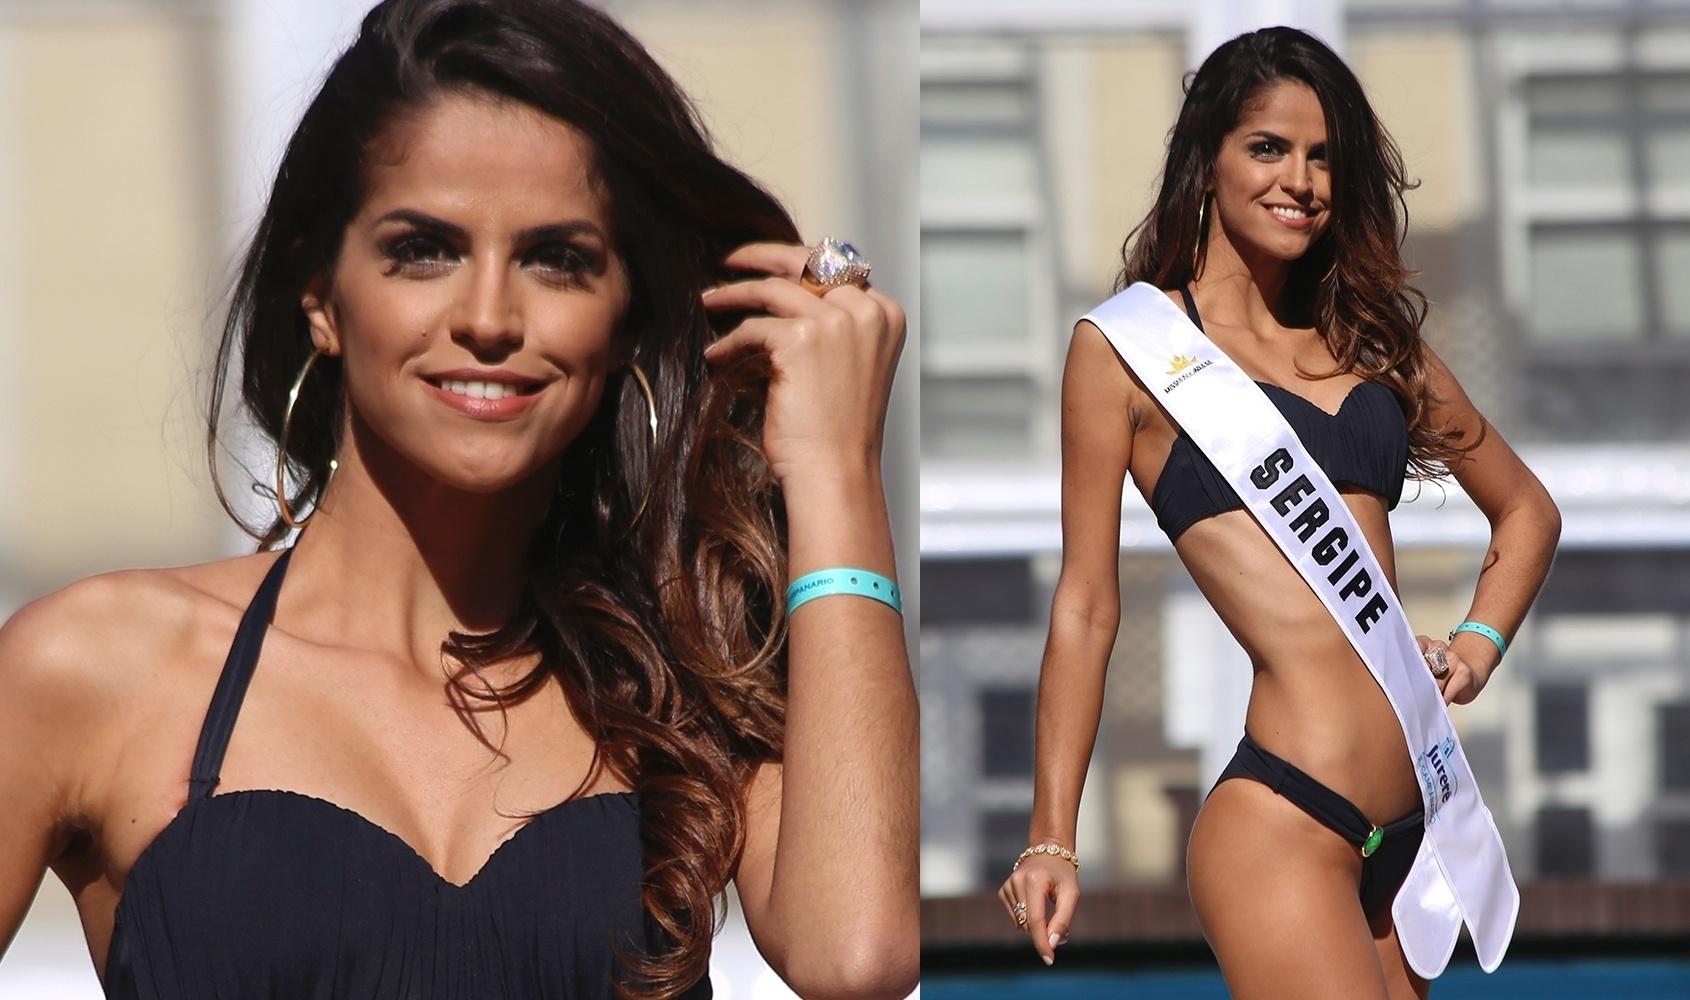 23.jun.2016 - SERGIPE - Katiúscia Oliveira Menezes, 25, modelo e assistente administrativa